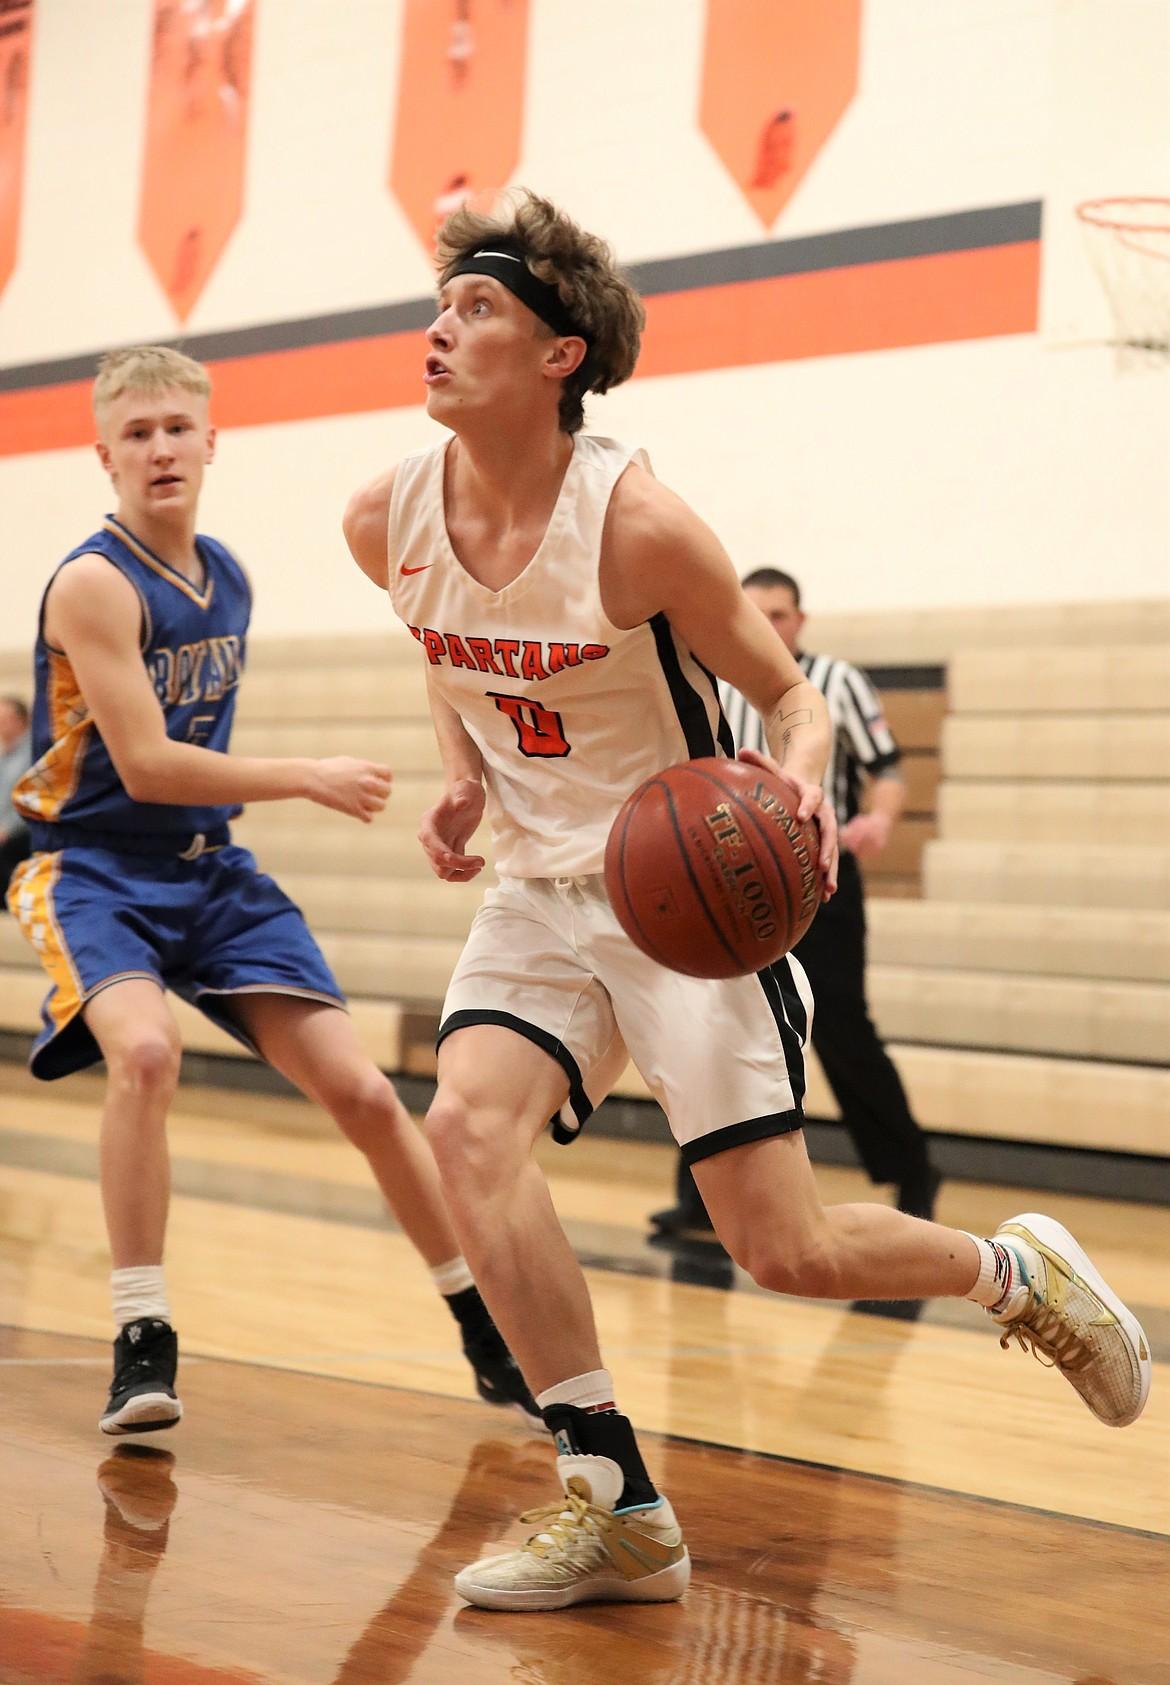 Junior Travis Mathews drives toward the basket during Monday's game.